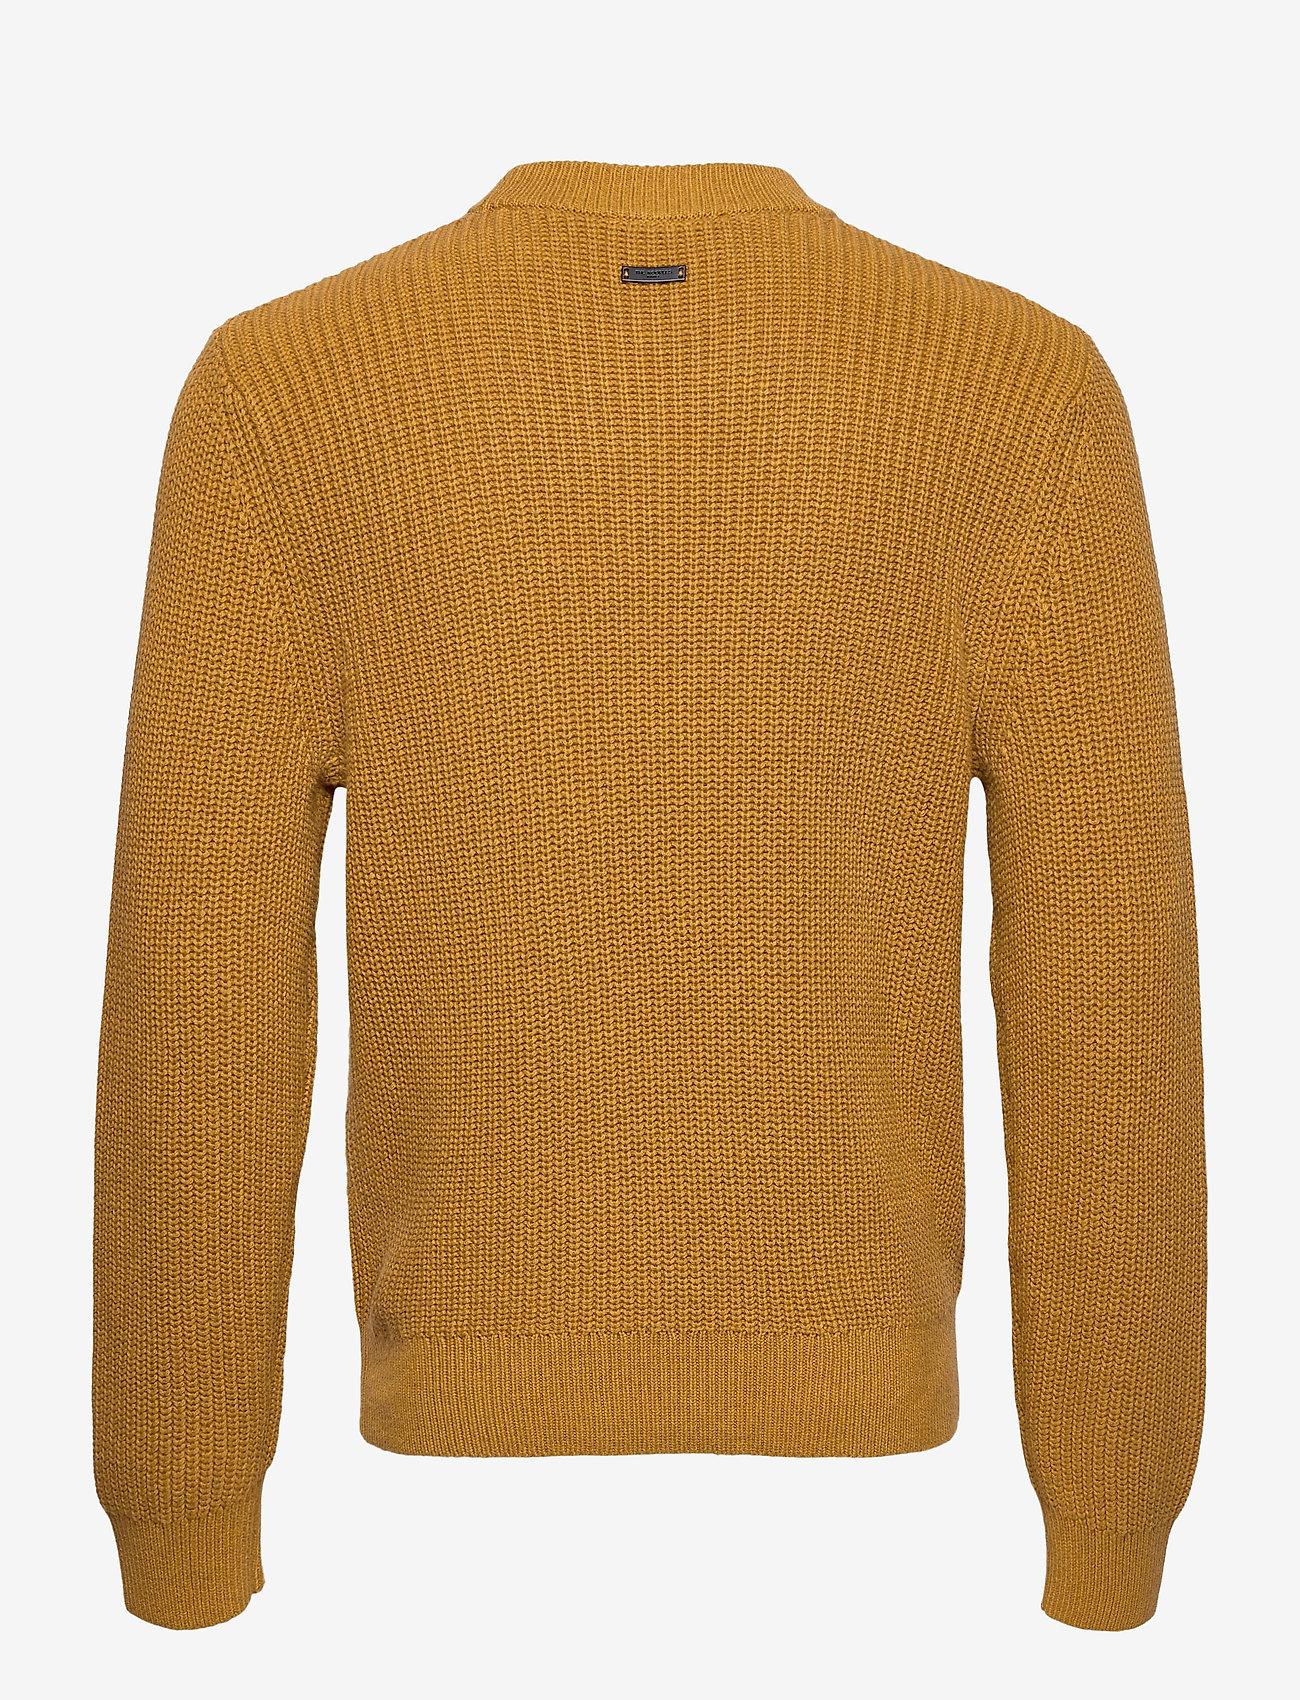 Pull (Yellow) (1499.25 €) - The Kooples sBqcT